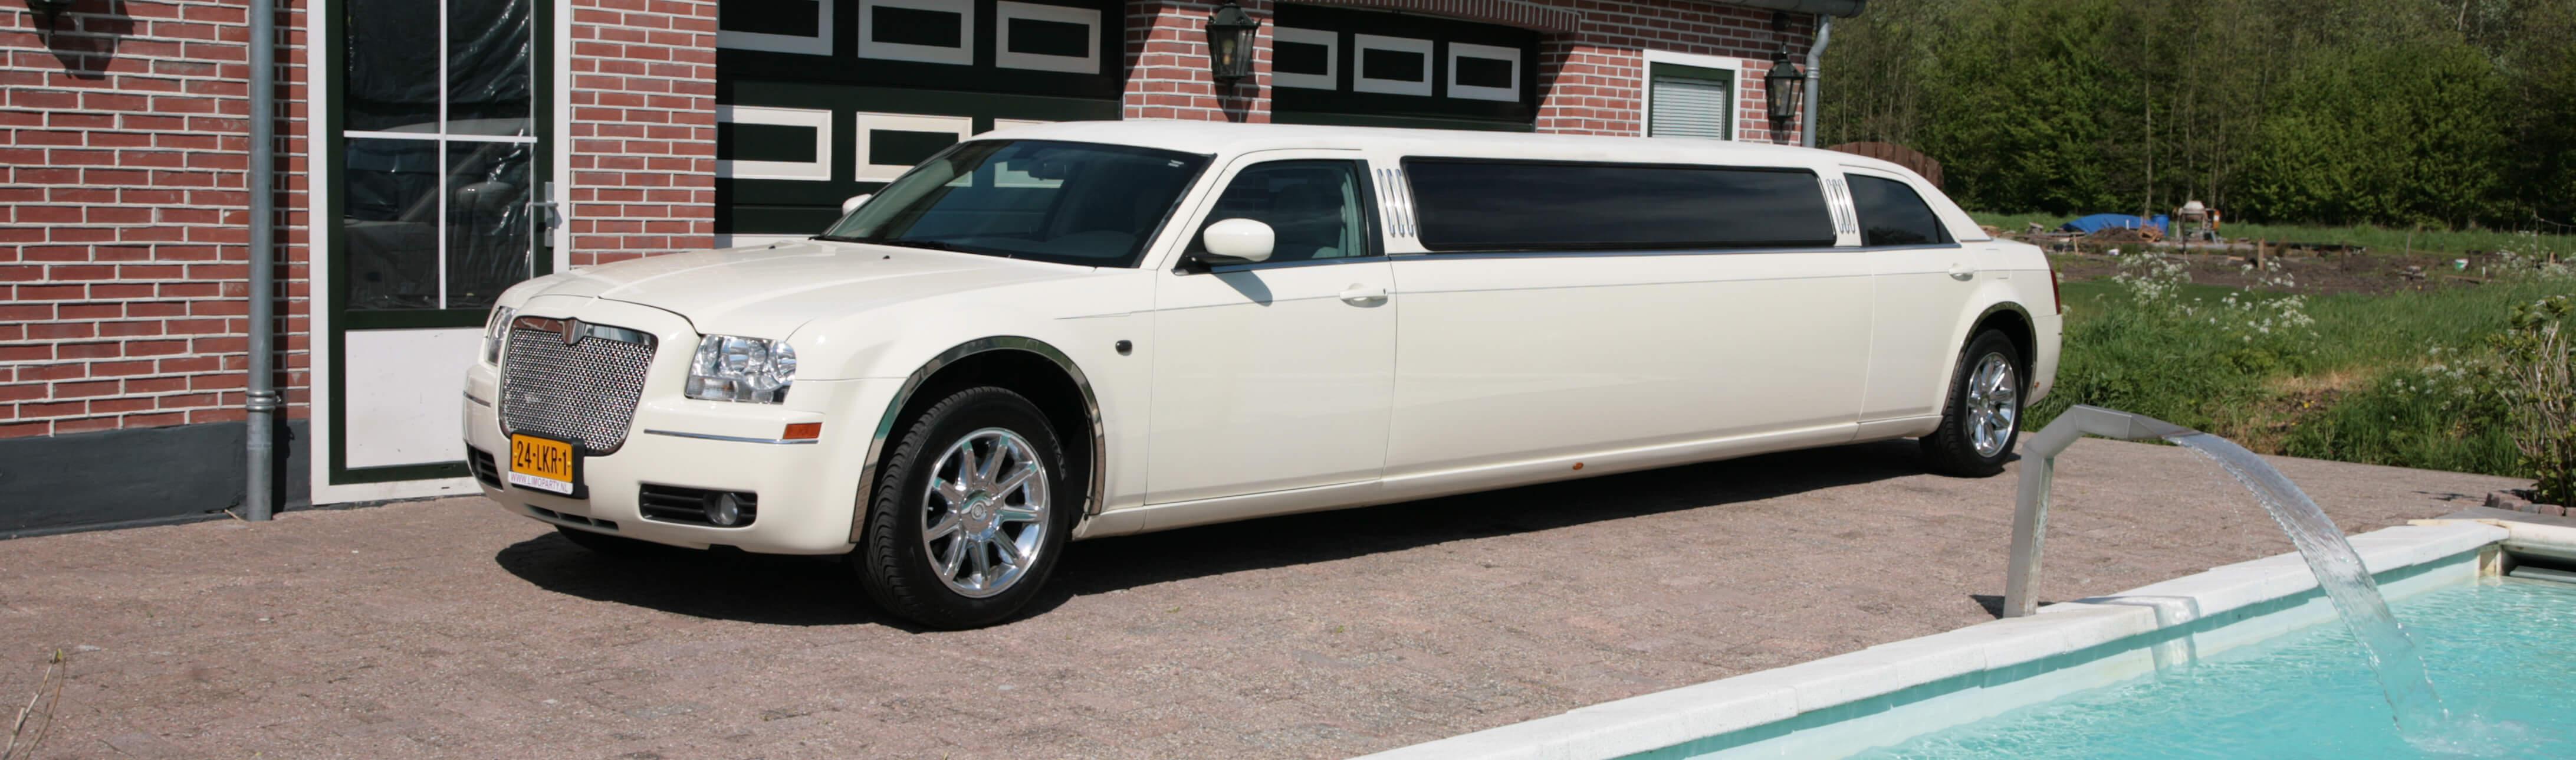 Prijzen limo, Limousine verhuur Utrecht, limo te huur Chrysler 300c limoparty.nl